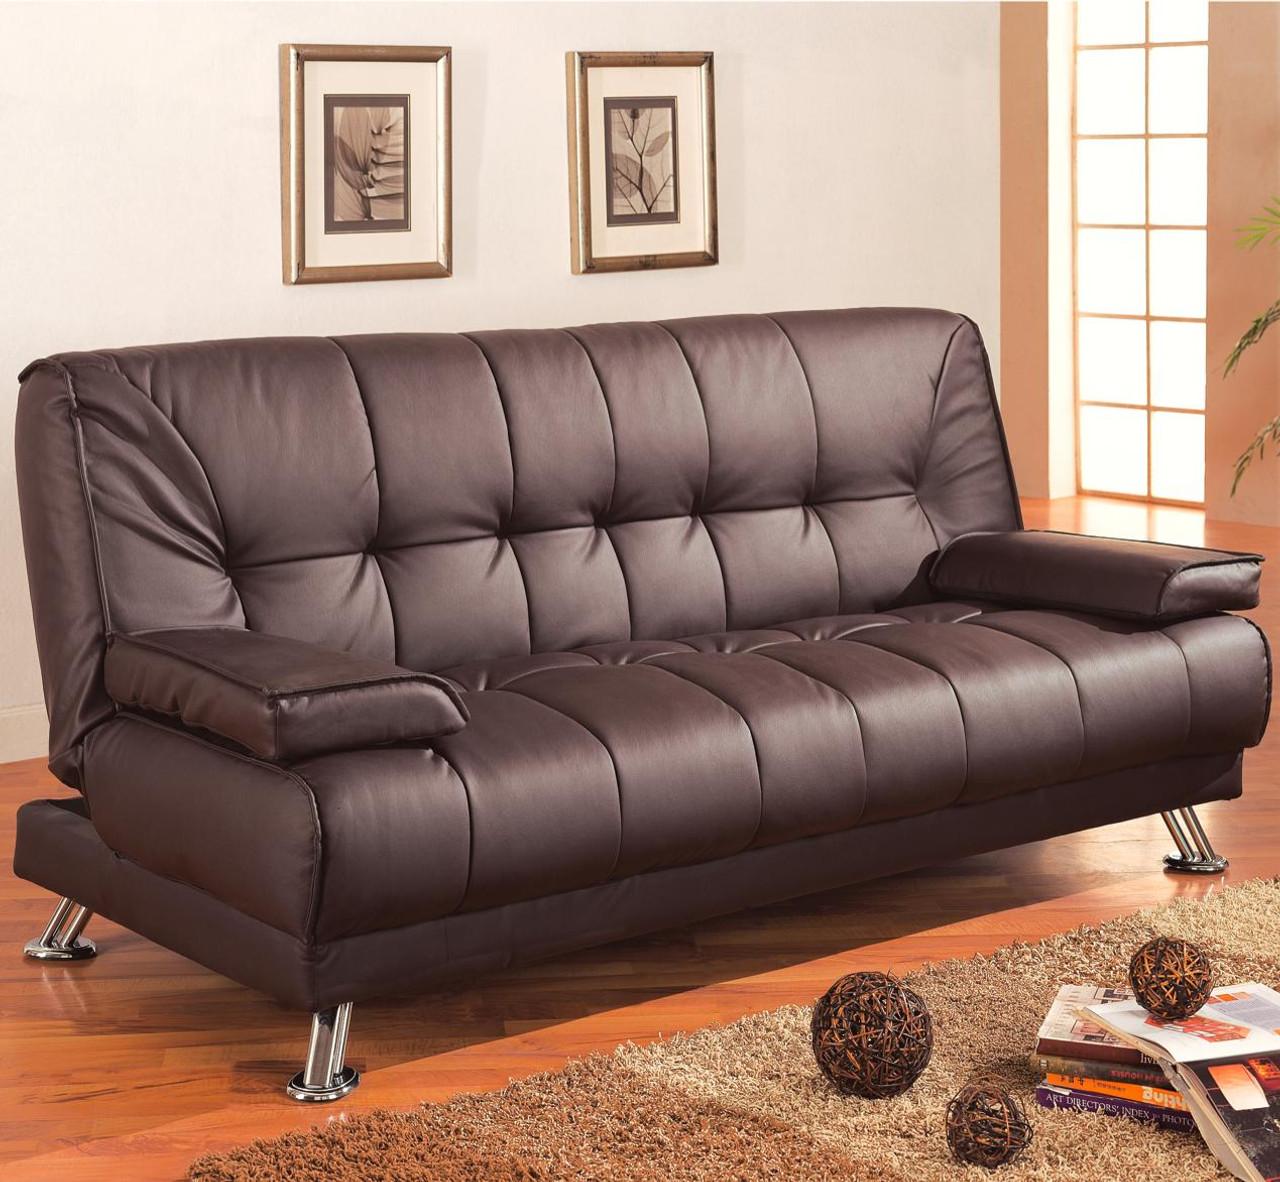 Coaster Braxton Black Faux Leather Futon Sofa Bed Image 1